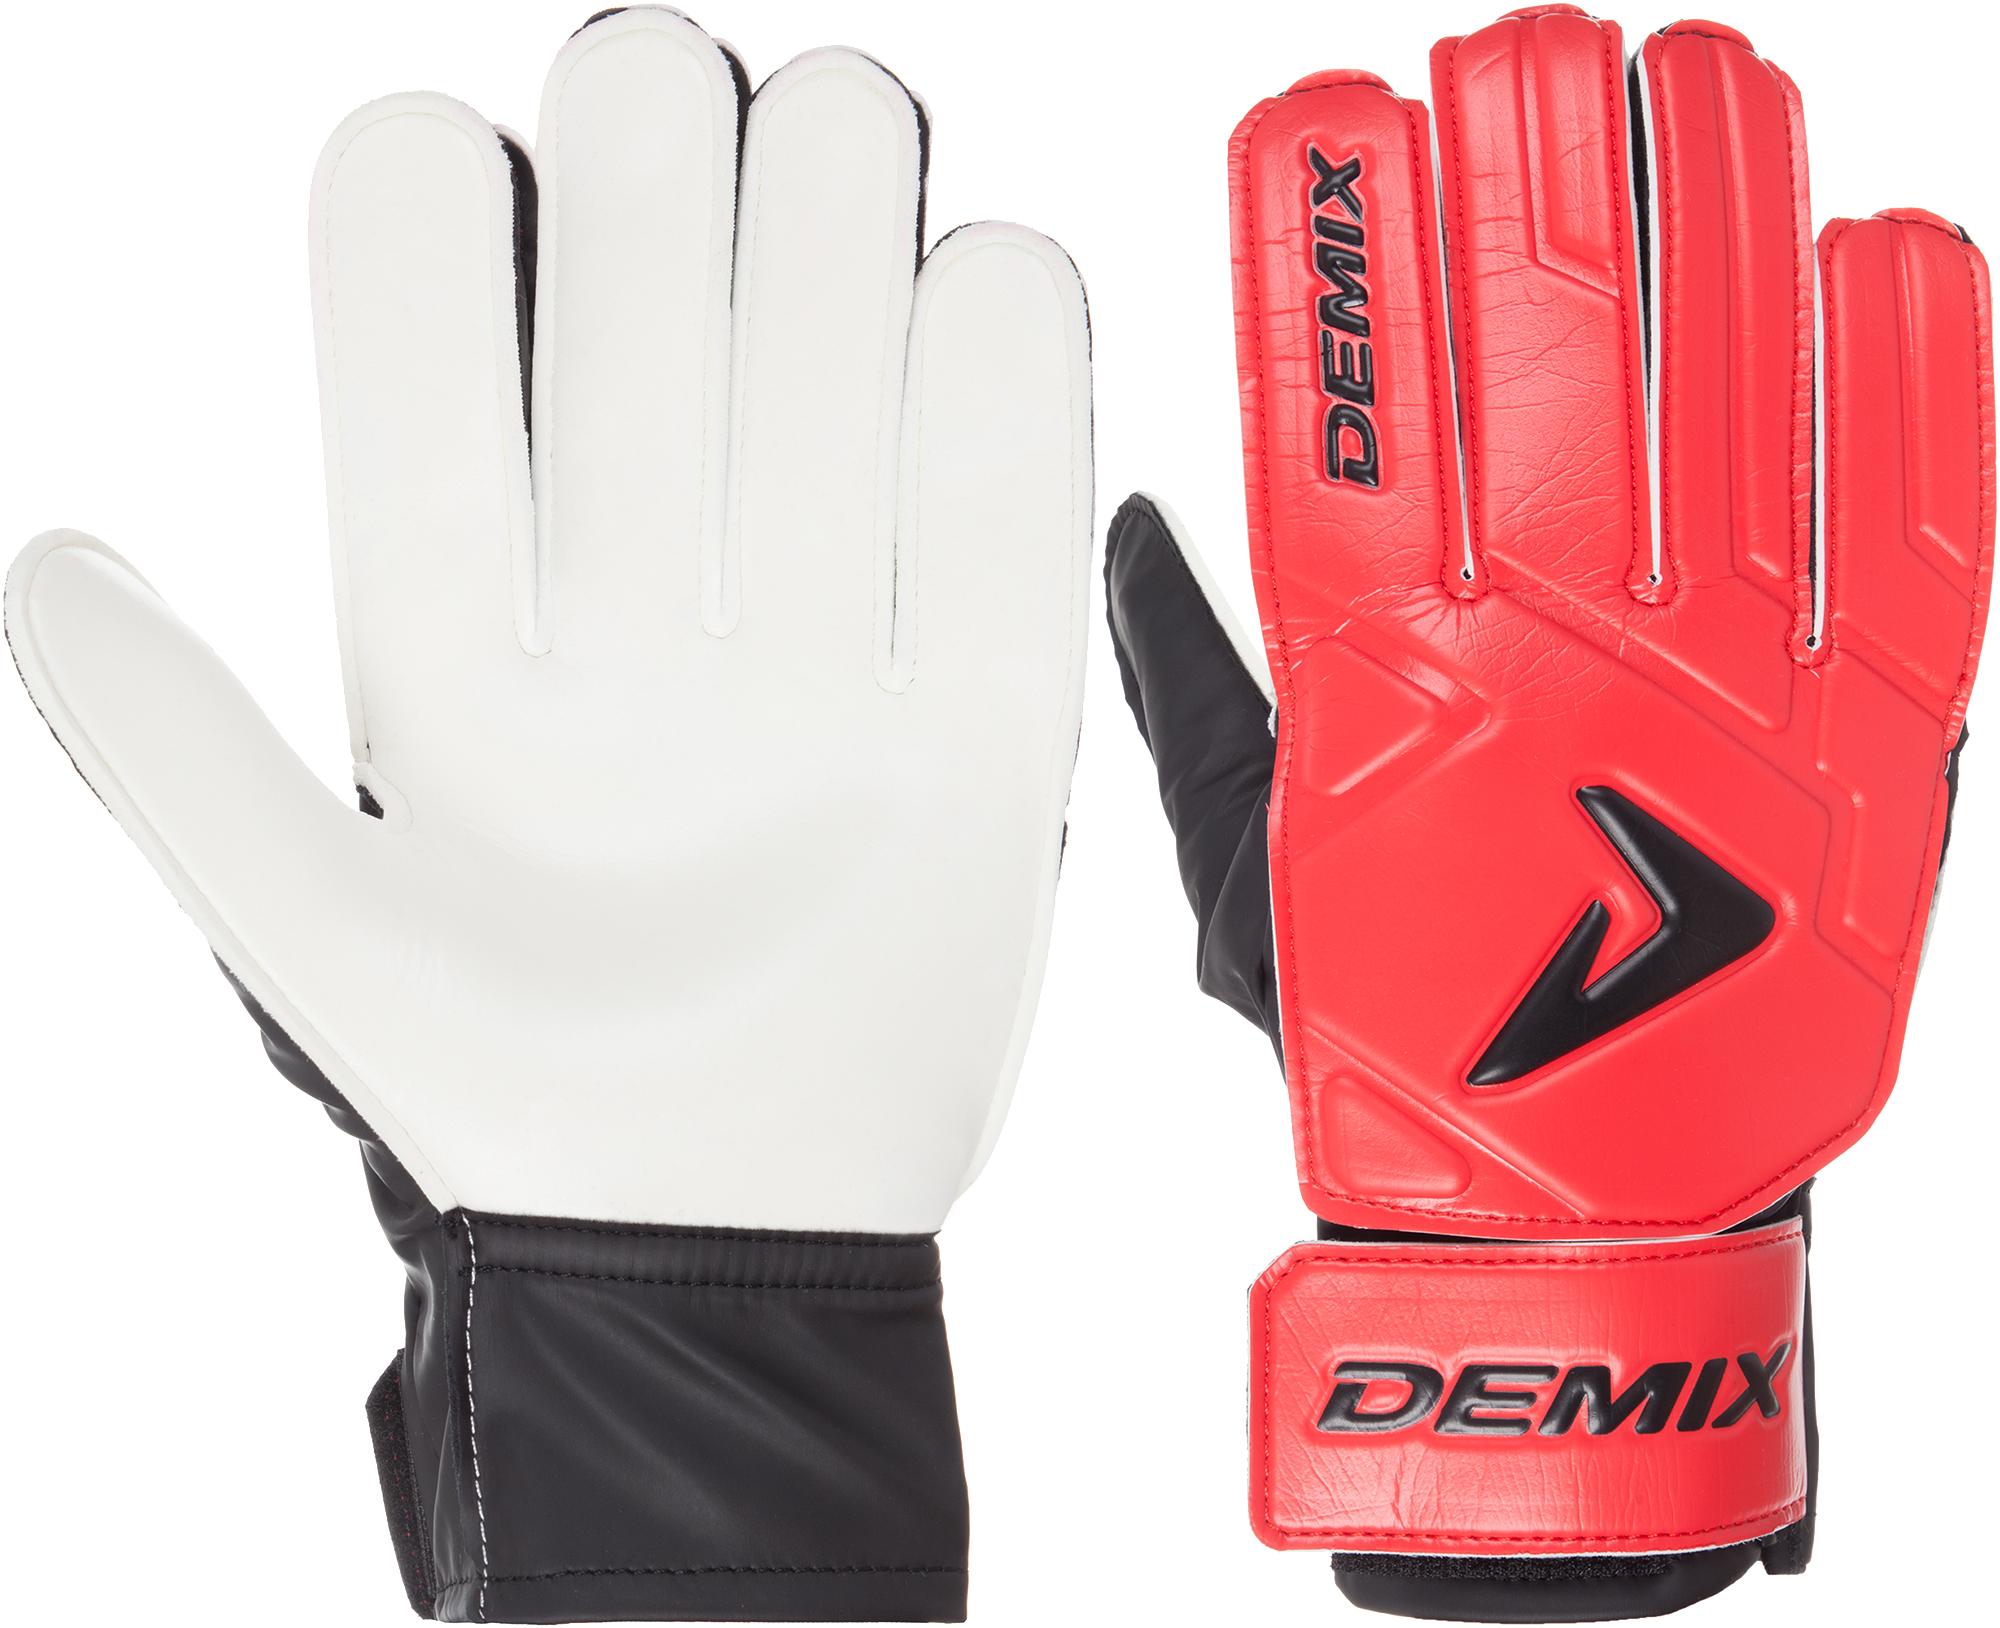 Demix Перчатки вратарские Demix, размер 9